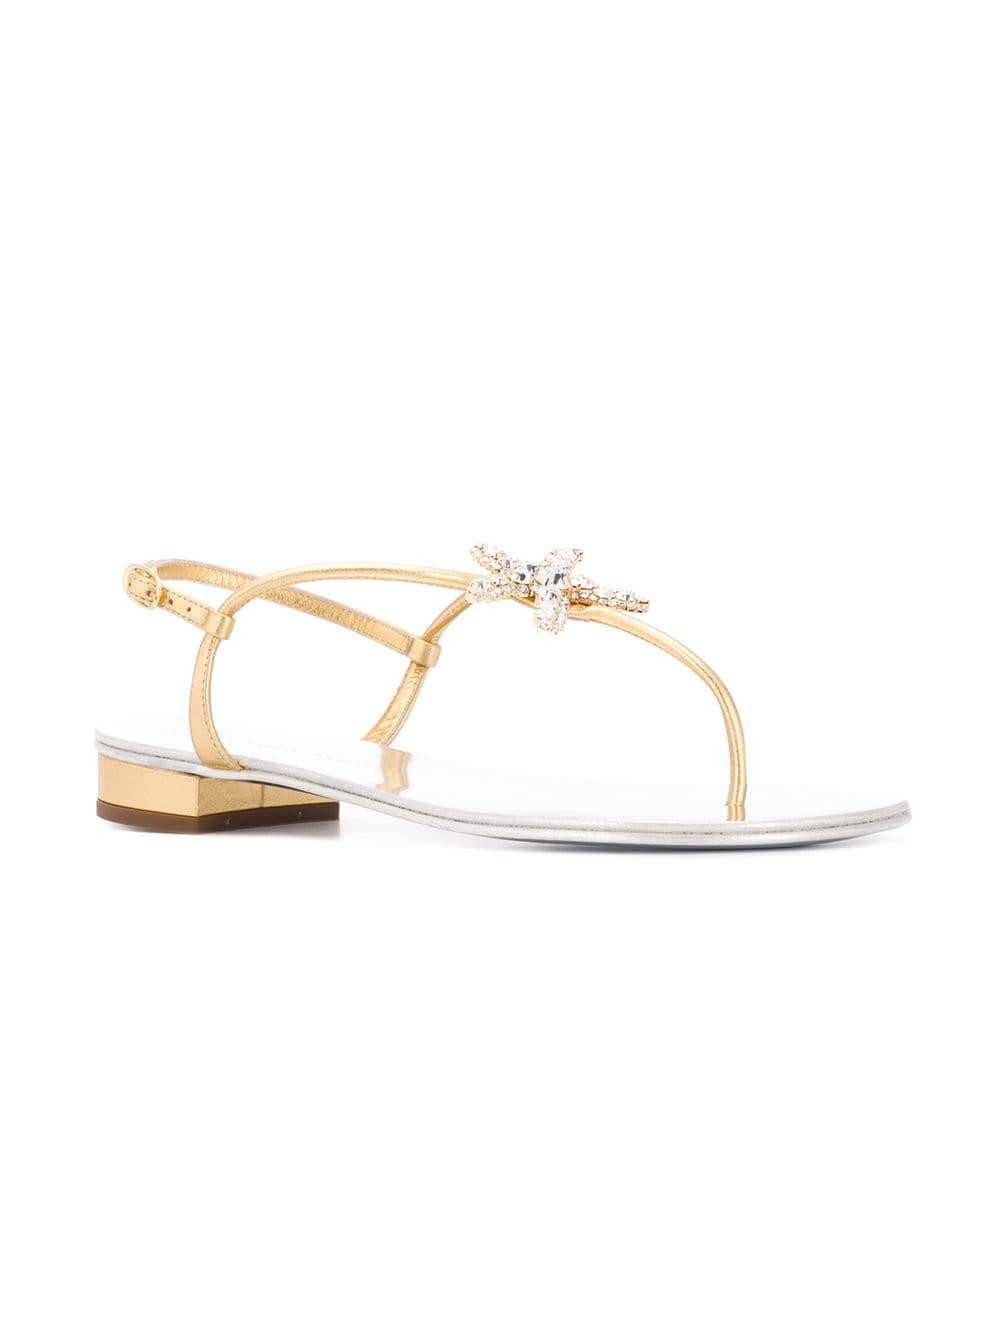 413e16707ebf1 Giuseppe Zanotti - Metallic Hollie Sandals - Lyst. View fullscreen